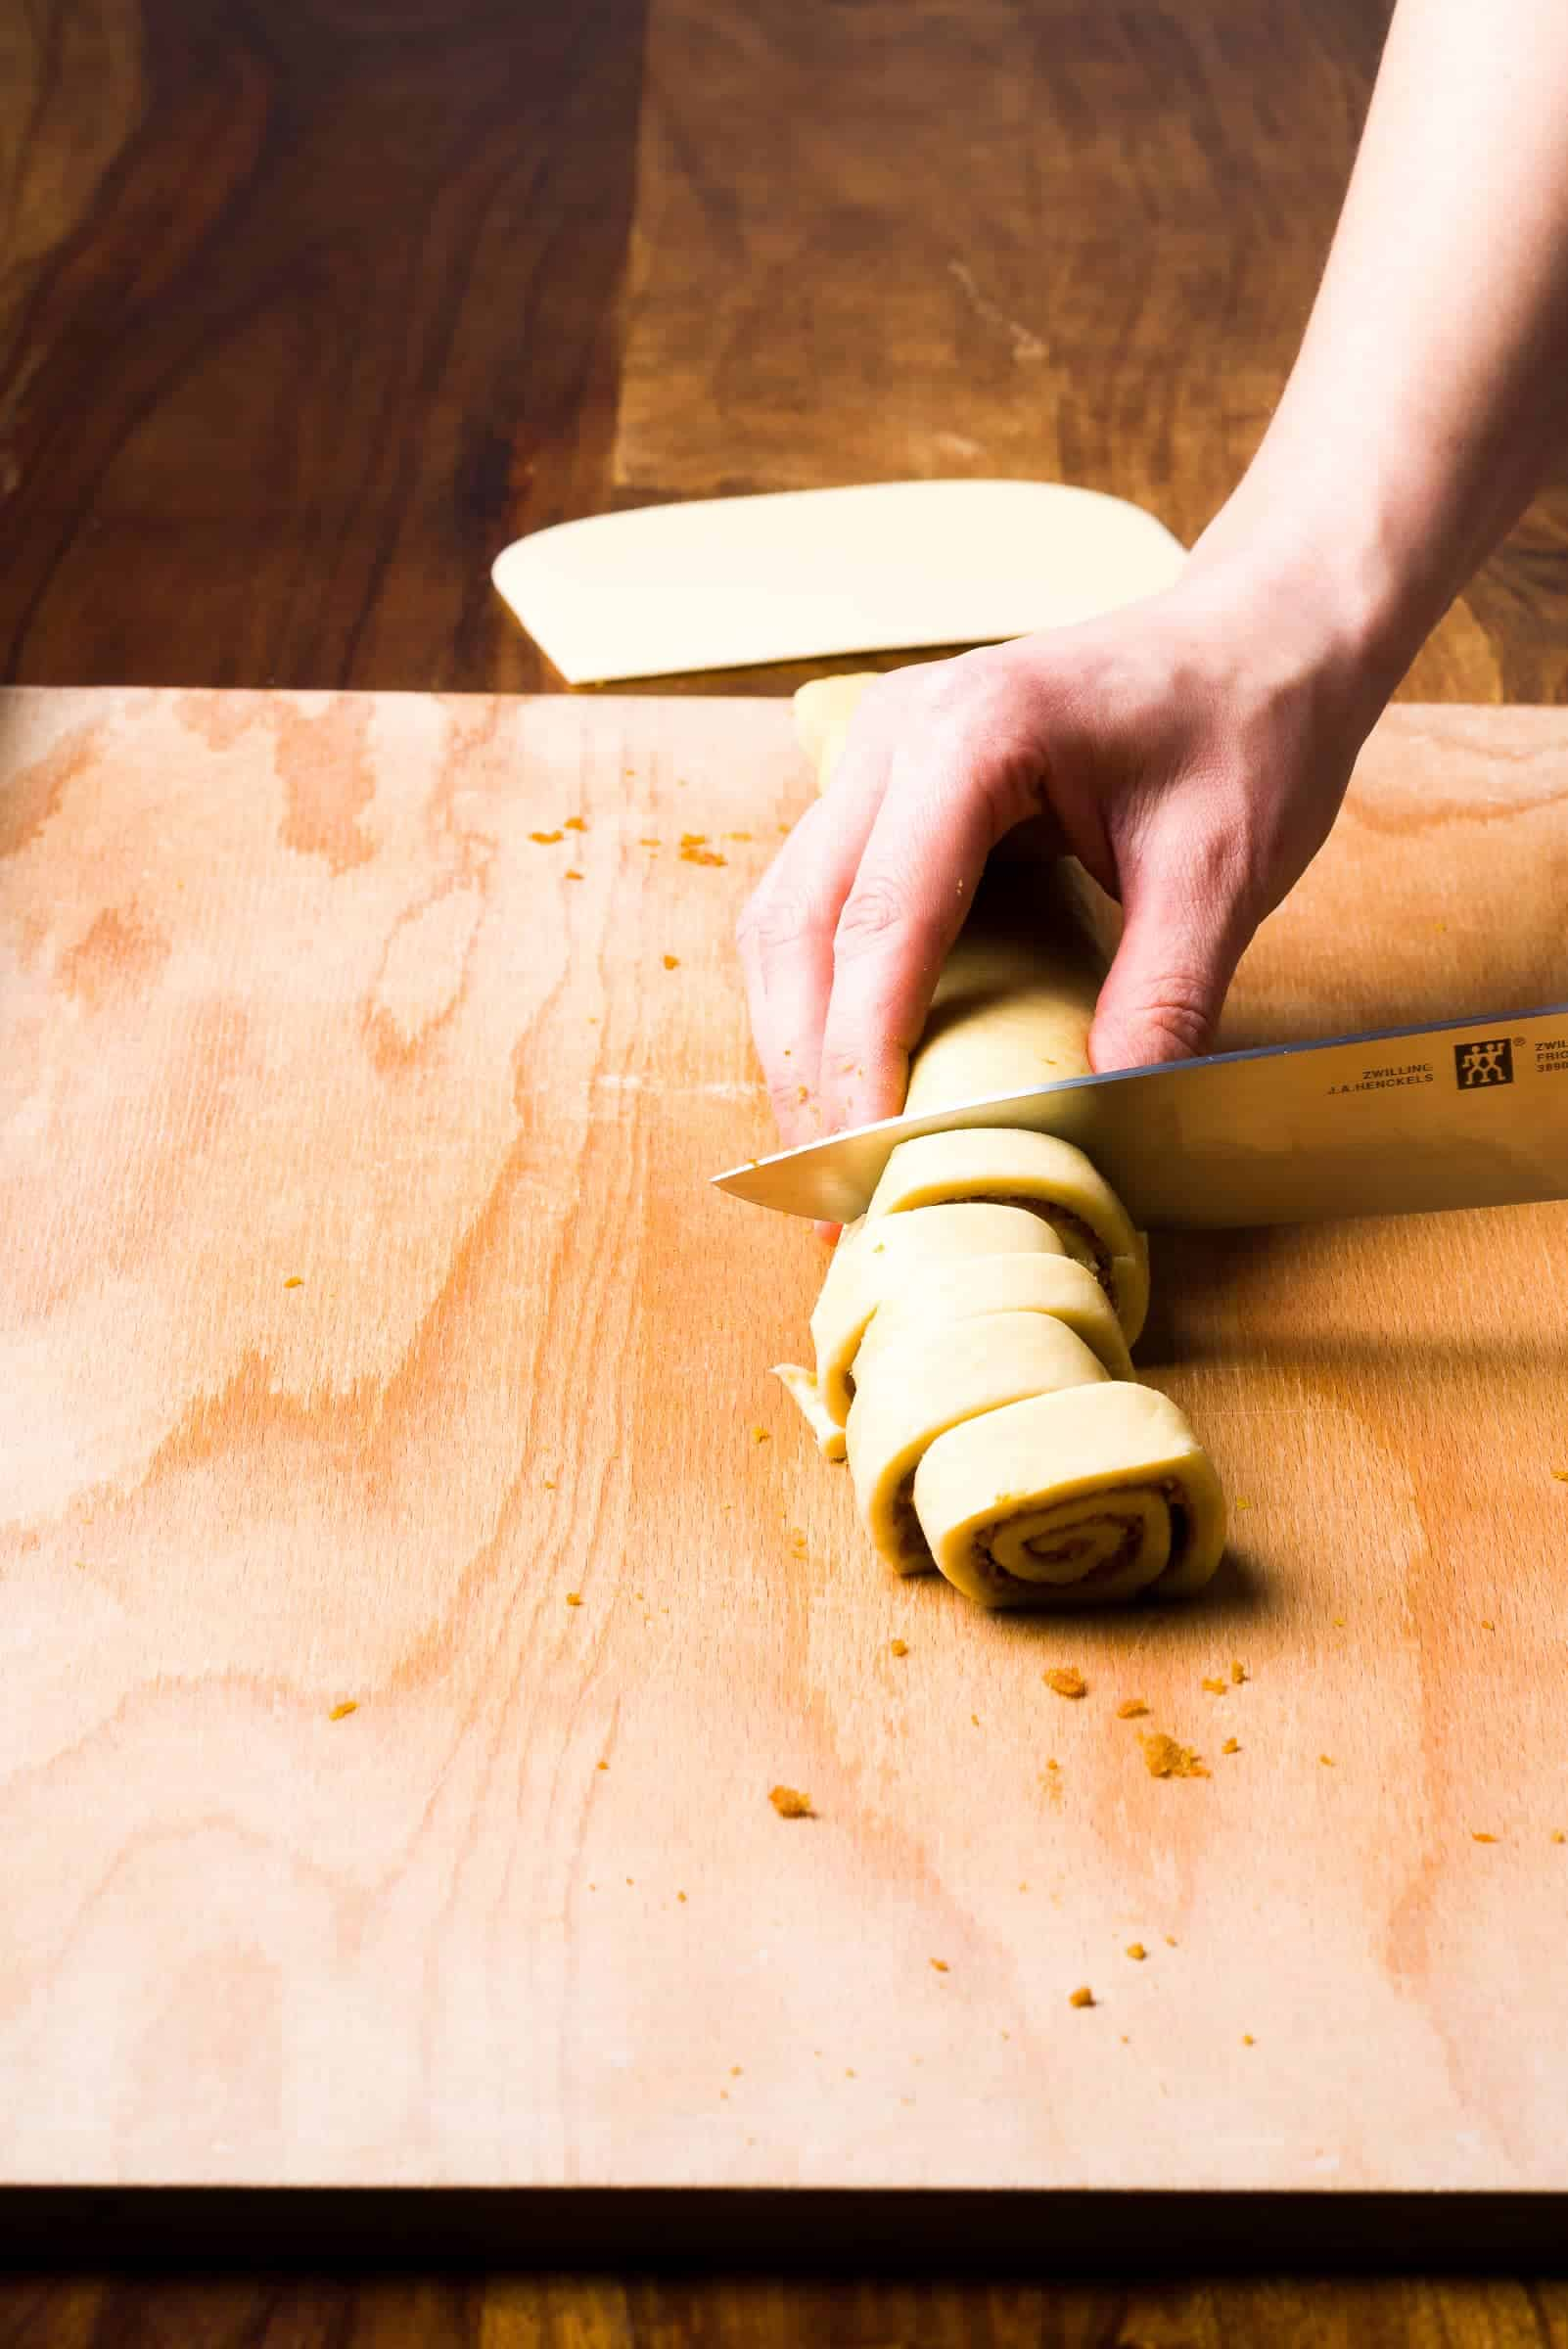 Arancini Marchigiani di carnevale ricetta GmamAm.com prep13